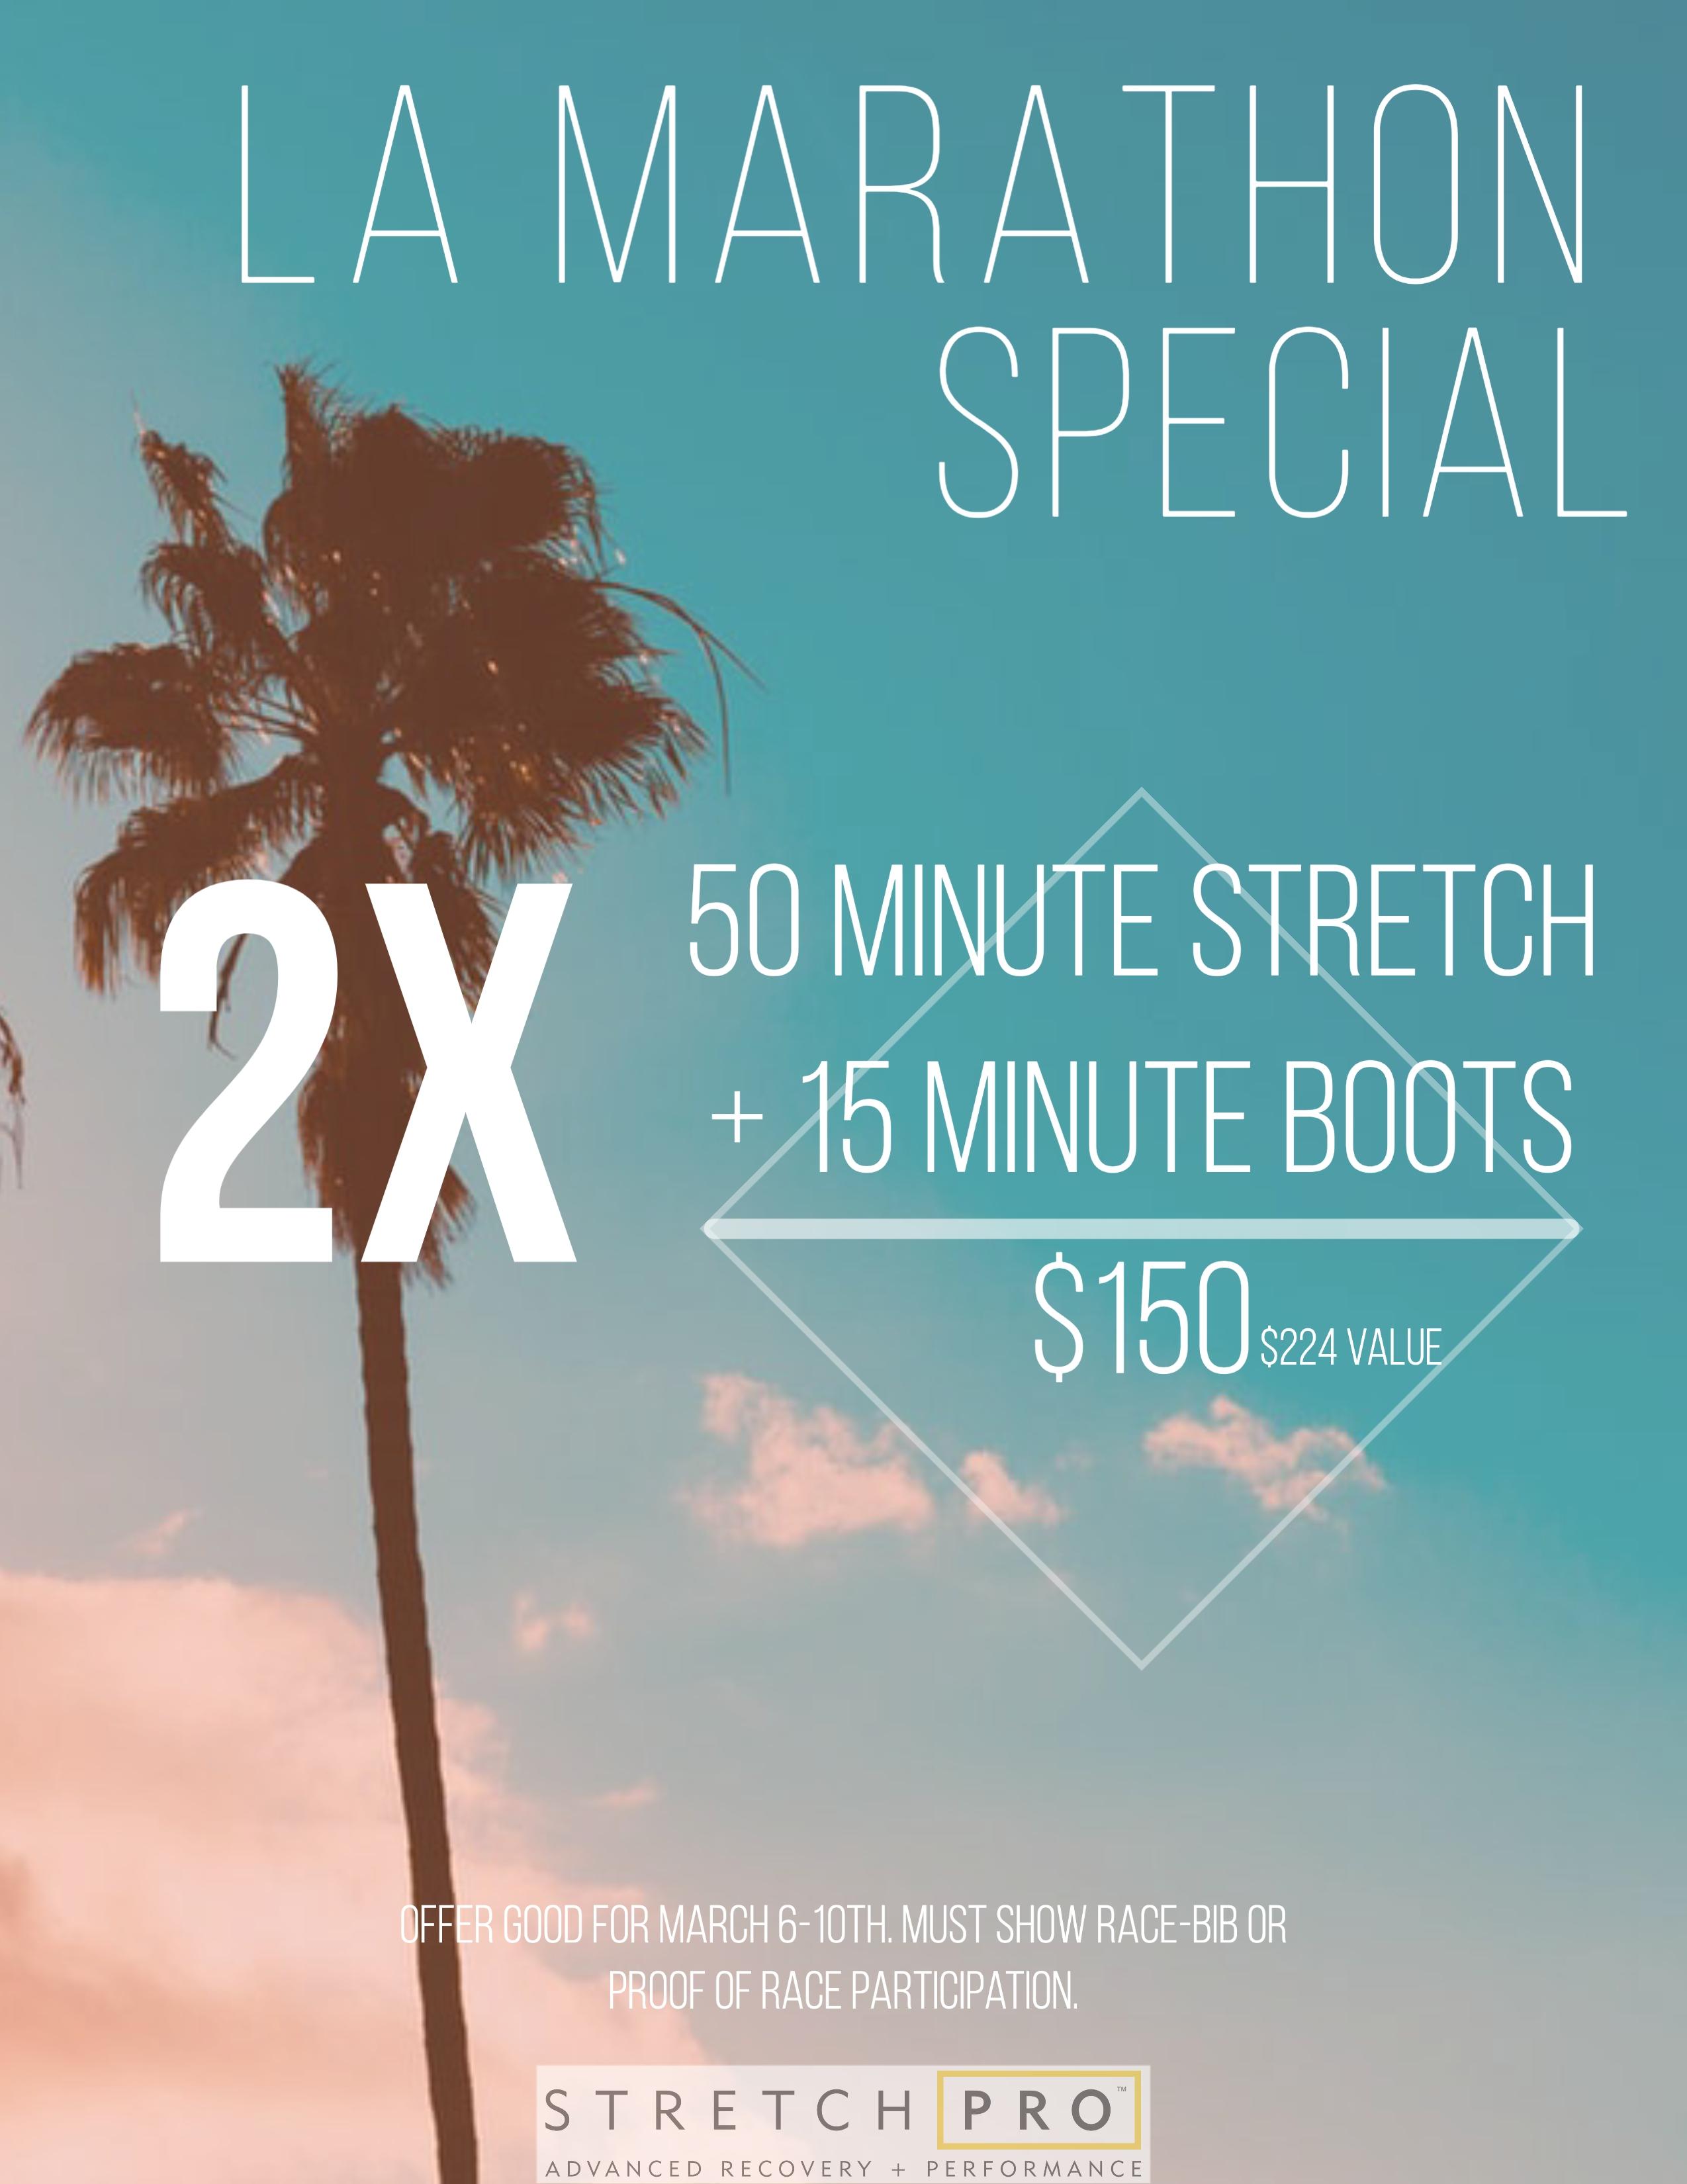 LA-marathon-special-print.jpg?mtime=20200304140903#asset:4473